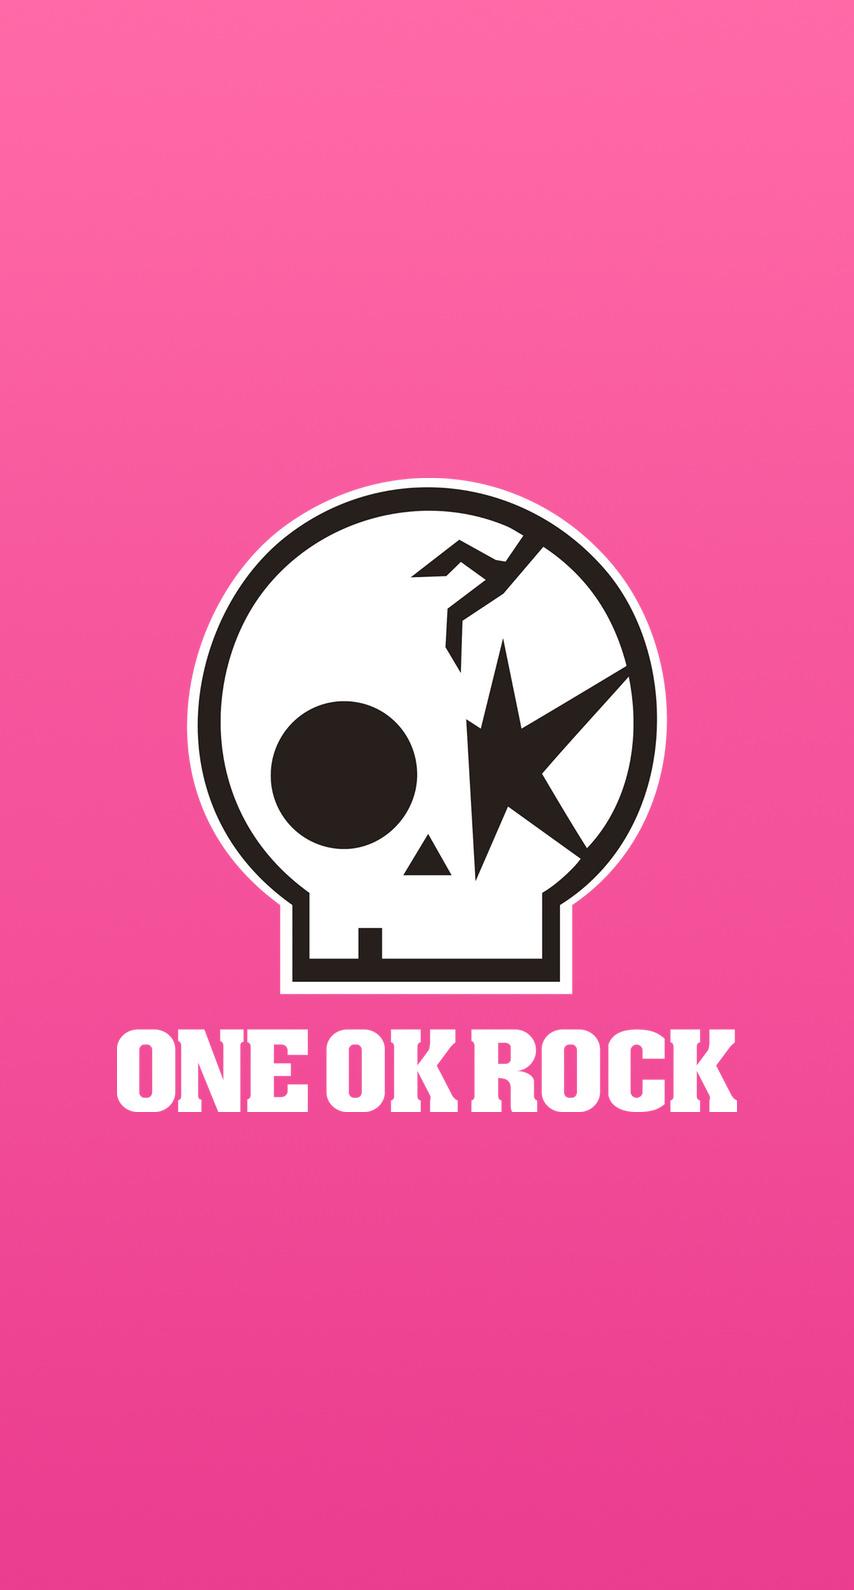 1d Iphone Wallpaper One Ok Rock ワンオクロゴ&ピンク めちゃ人気 Iphone壁紙dj